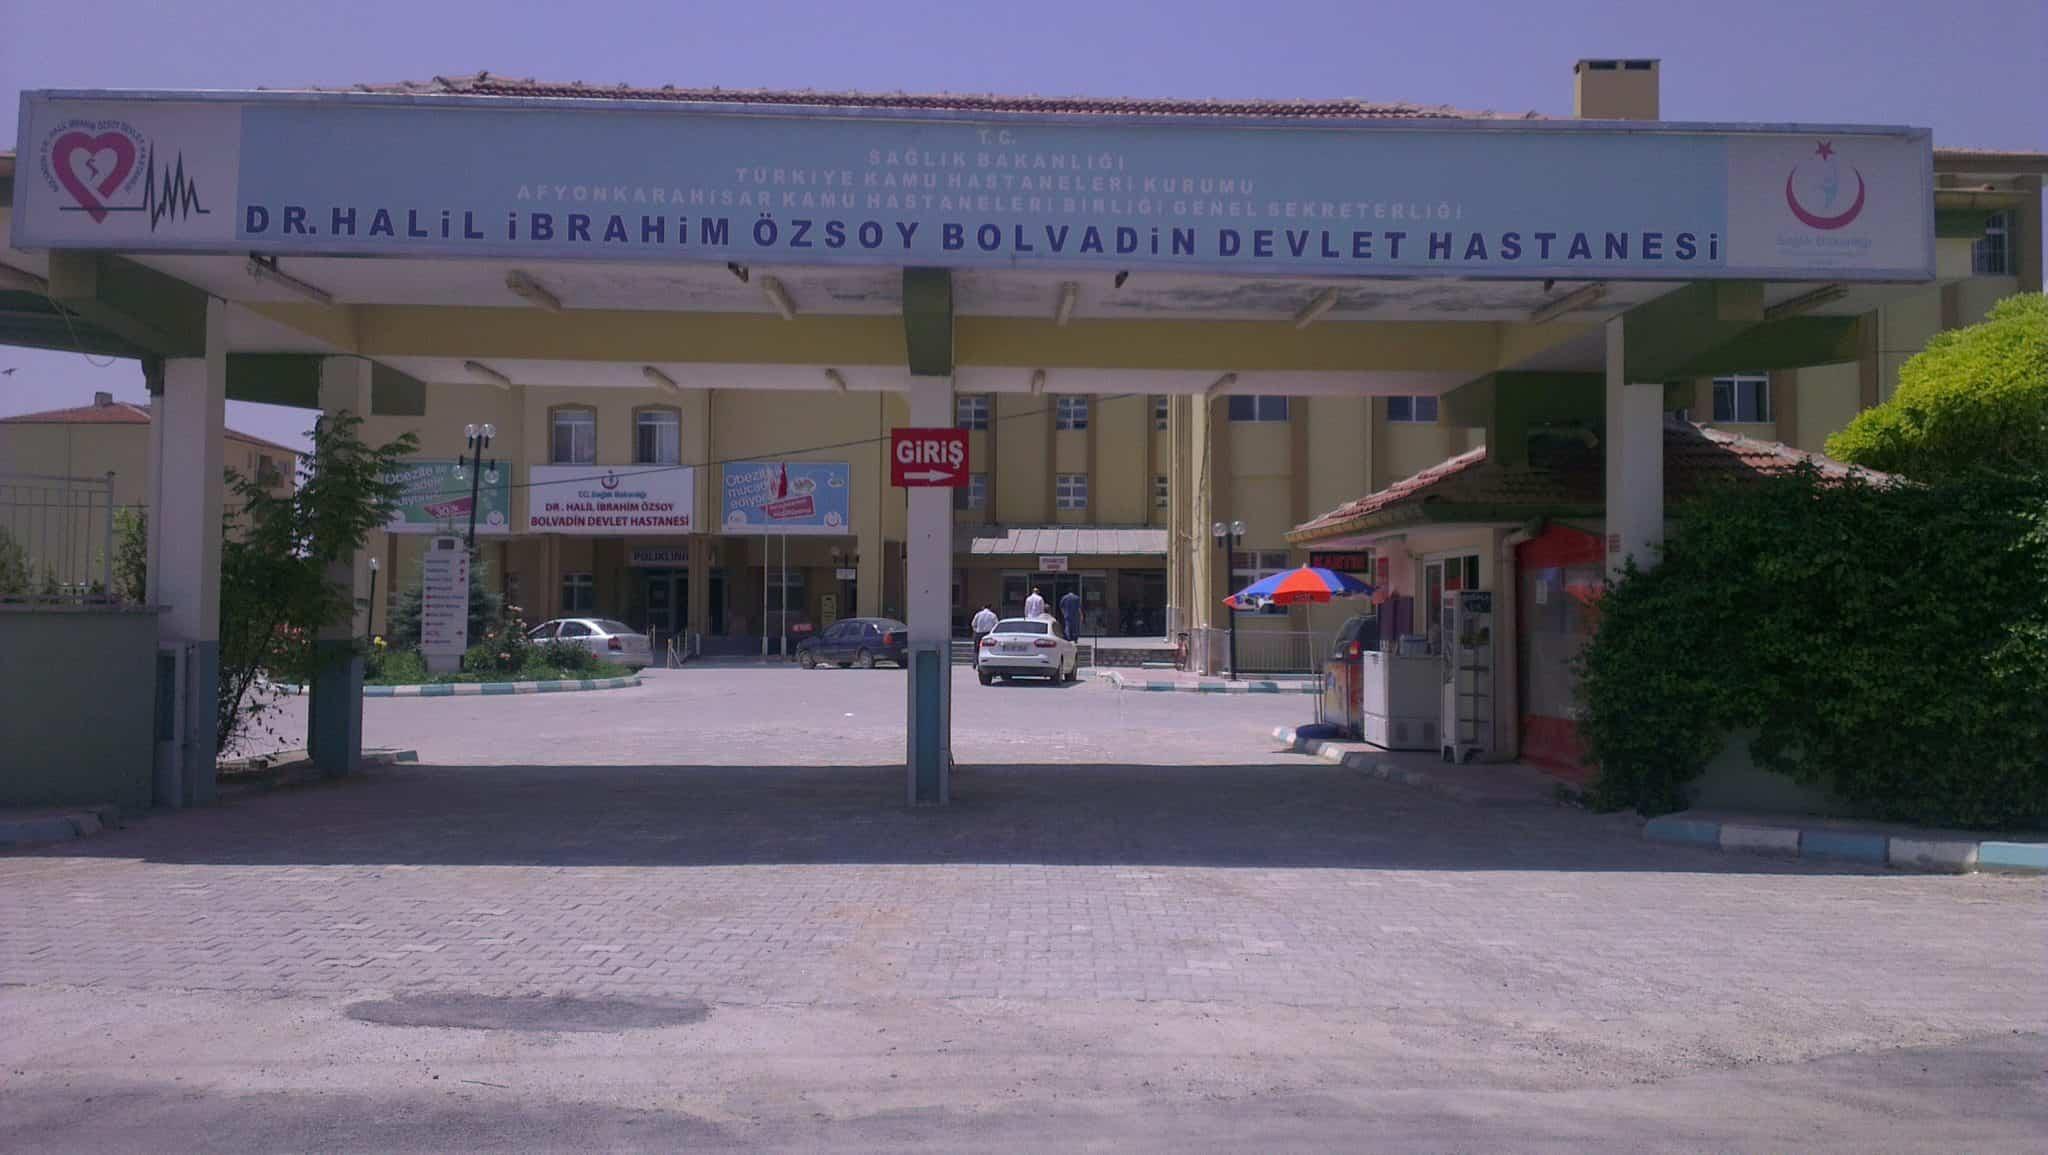 Photo of MHRS AFYONKARAHİSAR DR. HALİL İBRAHİM ÖZSOY BOLVADİN DEVLET HASTANESİ RANDEVU ALMA